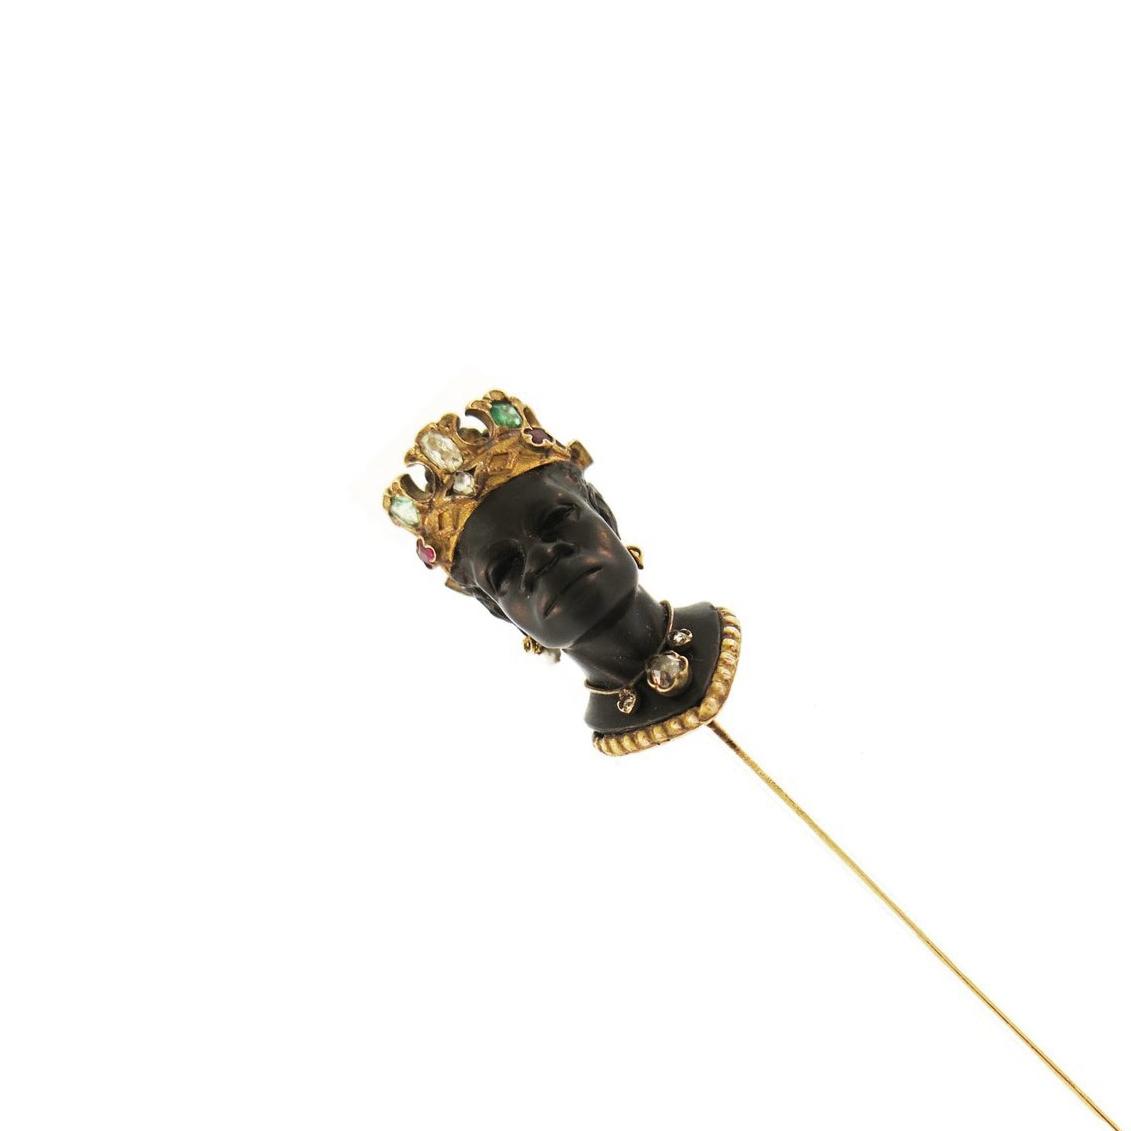 Vintage Blackamoor Gem-Set Stick Pin